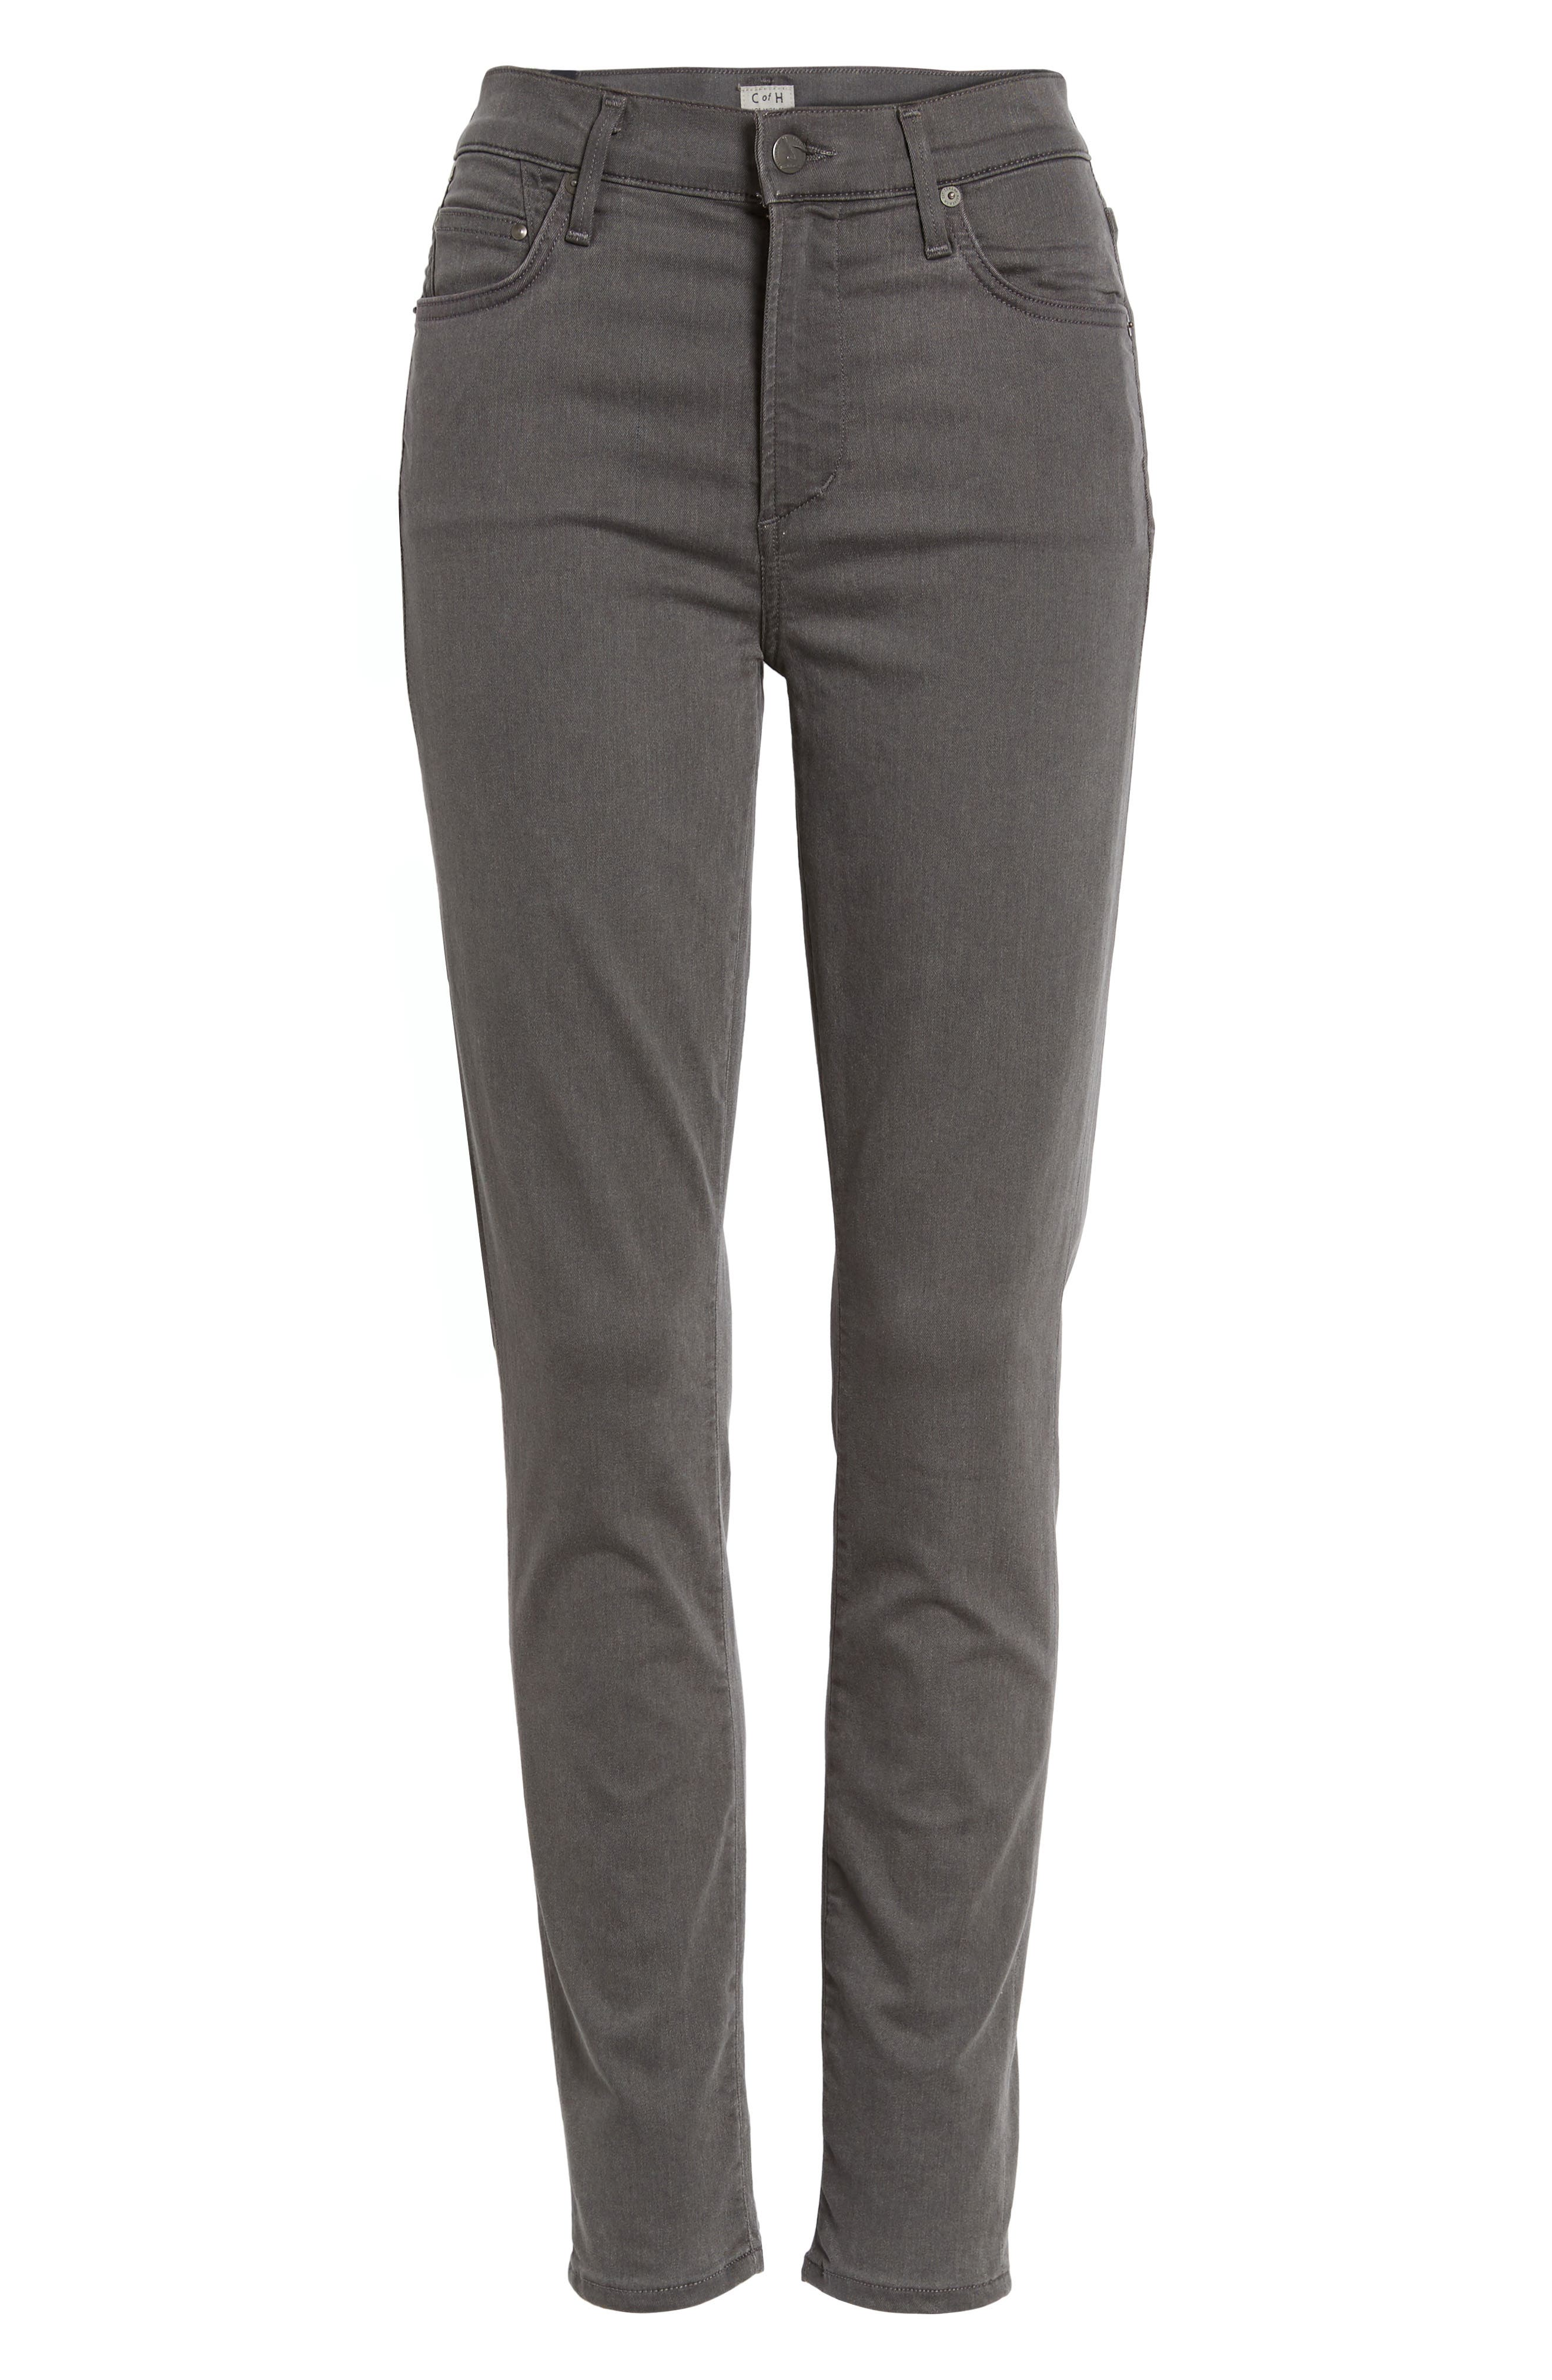 Rocket Petite High Waist Skinny Jeans,                             Alternate thumbnail 6, color,                             034